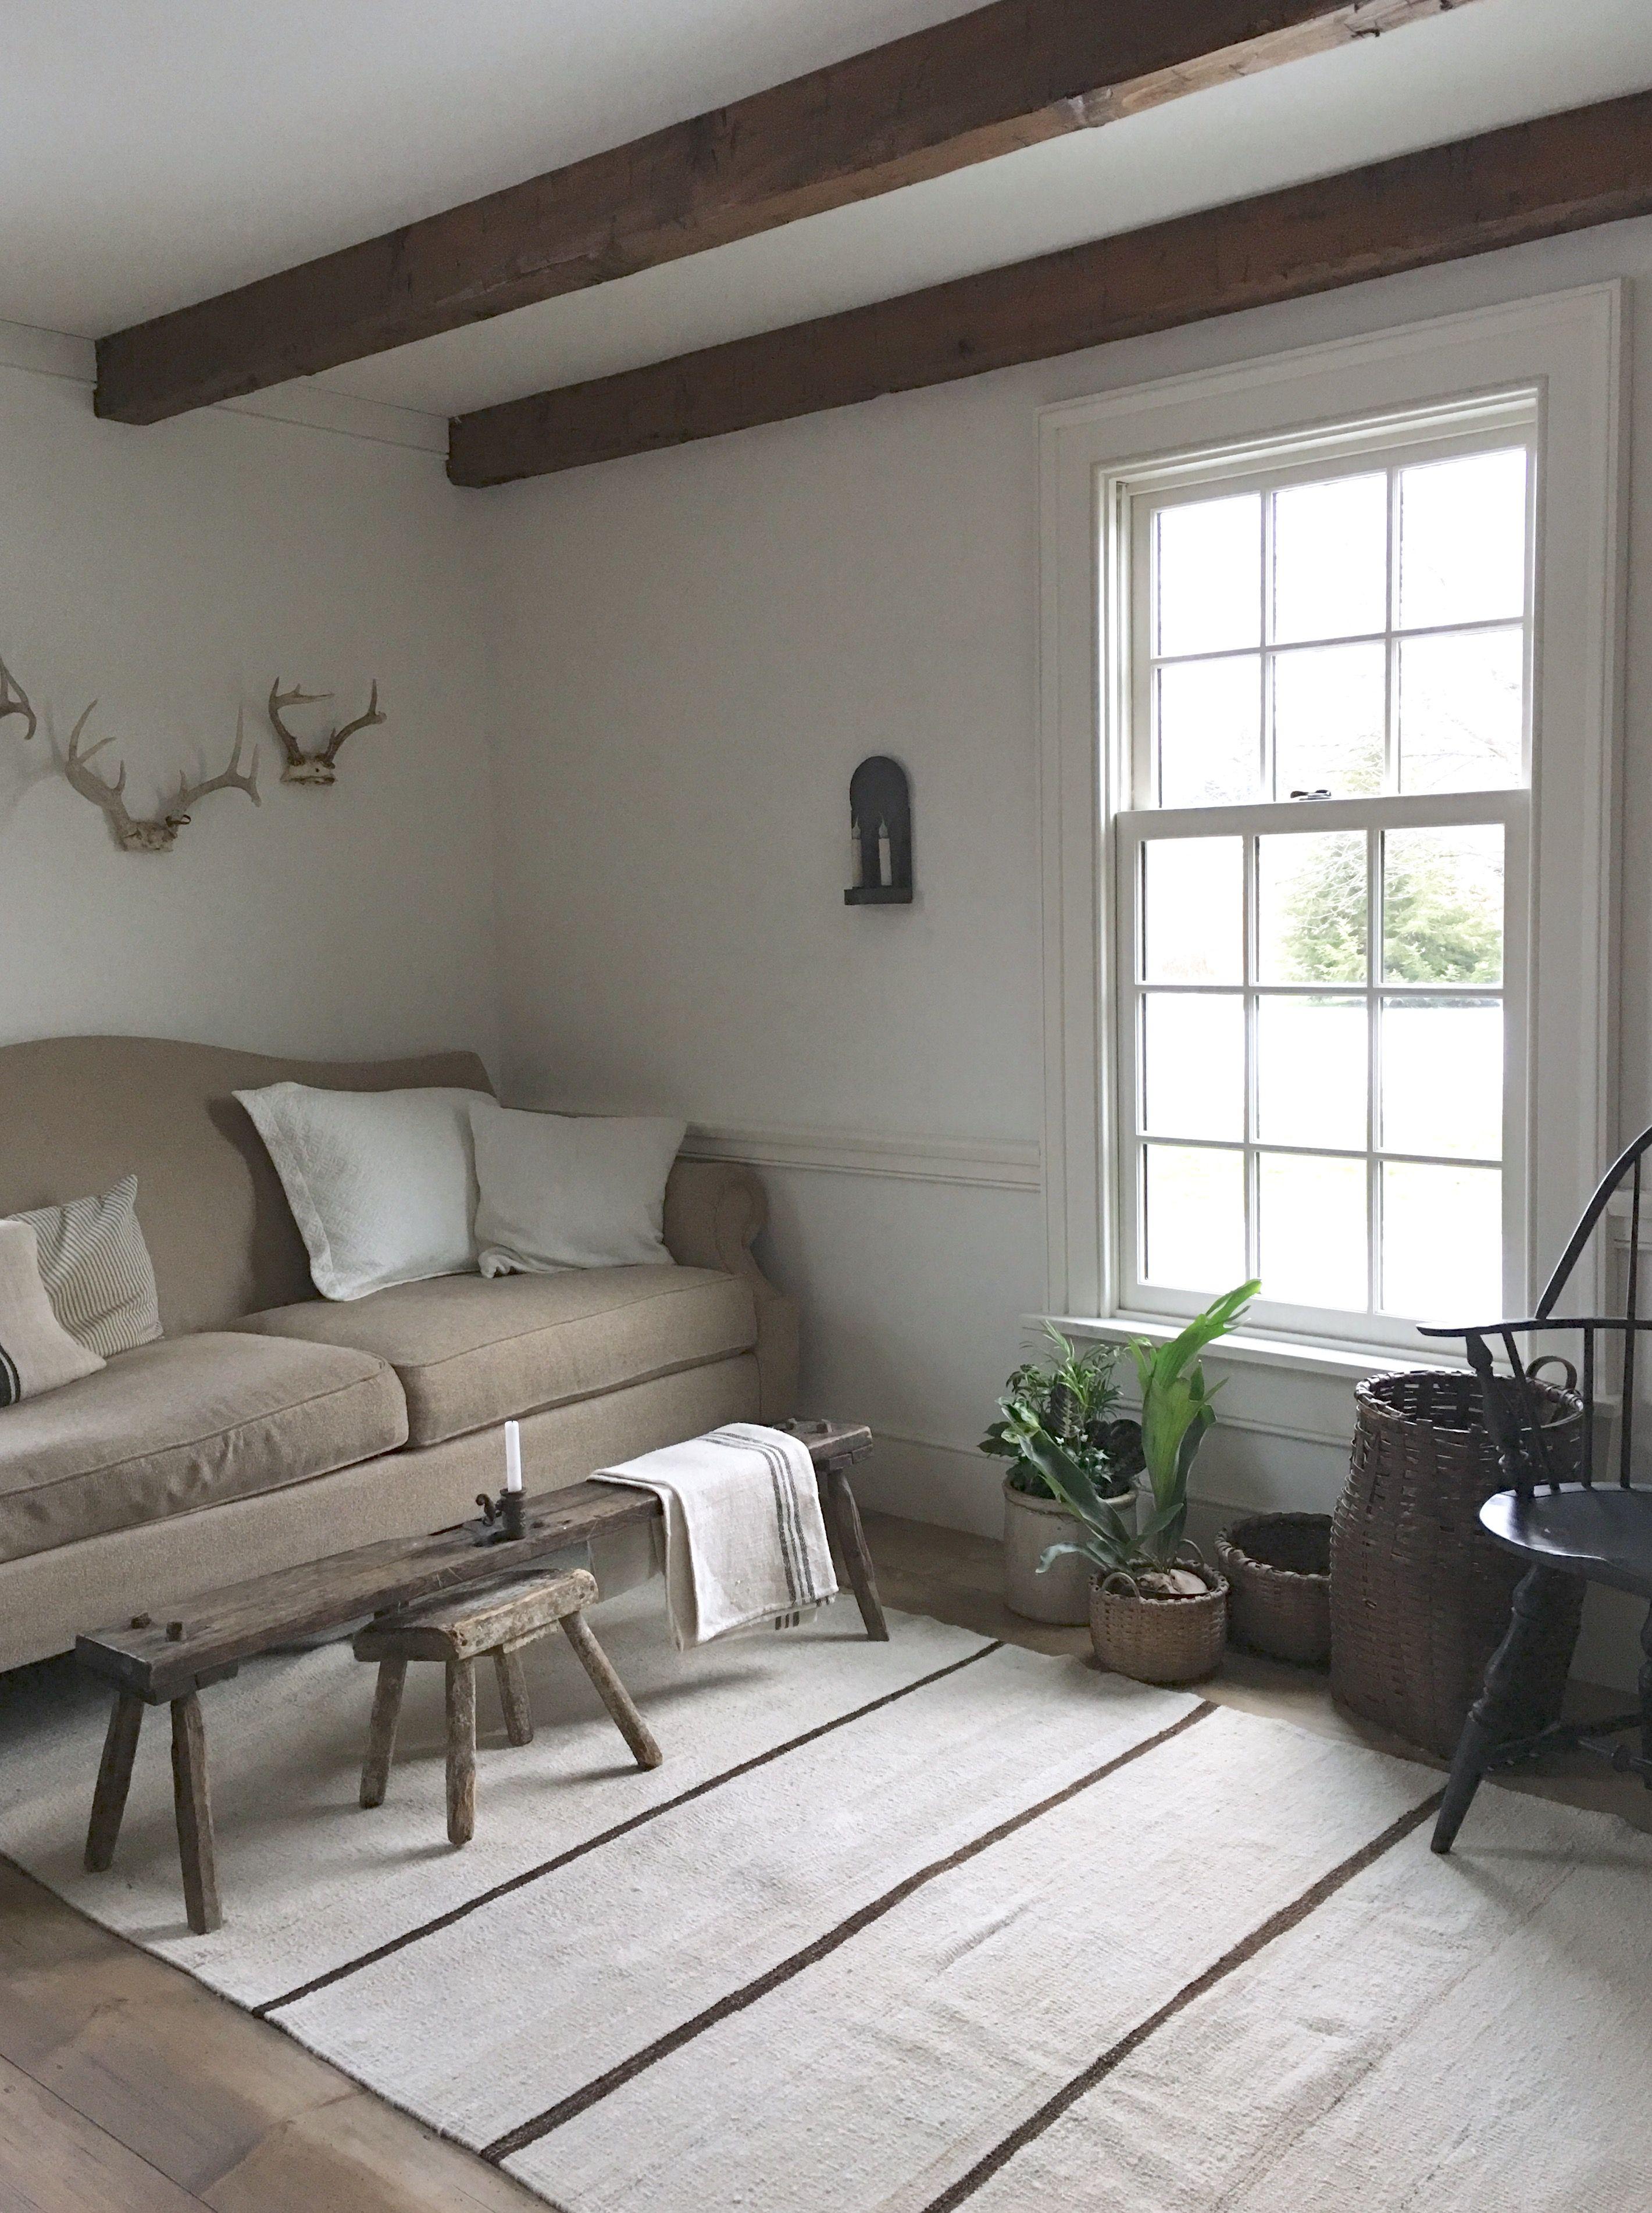 pin by kate fairbairn on home inspiration in 2019 home design rh in pinterest com